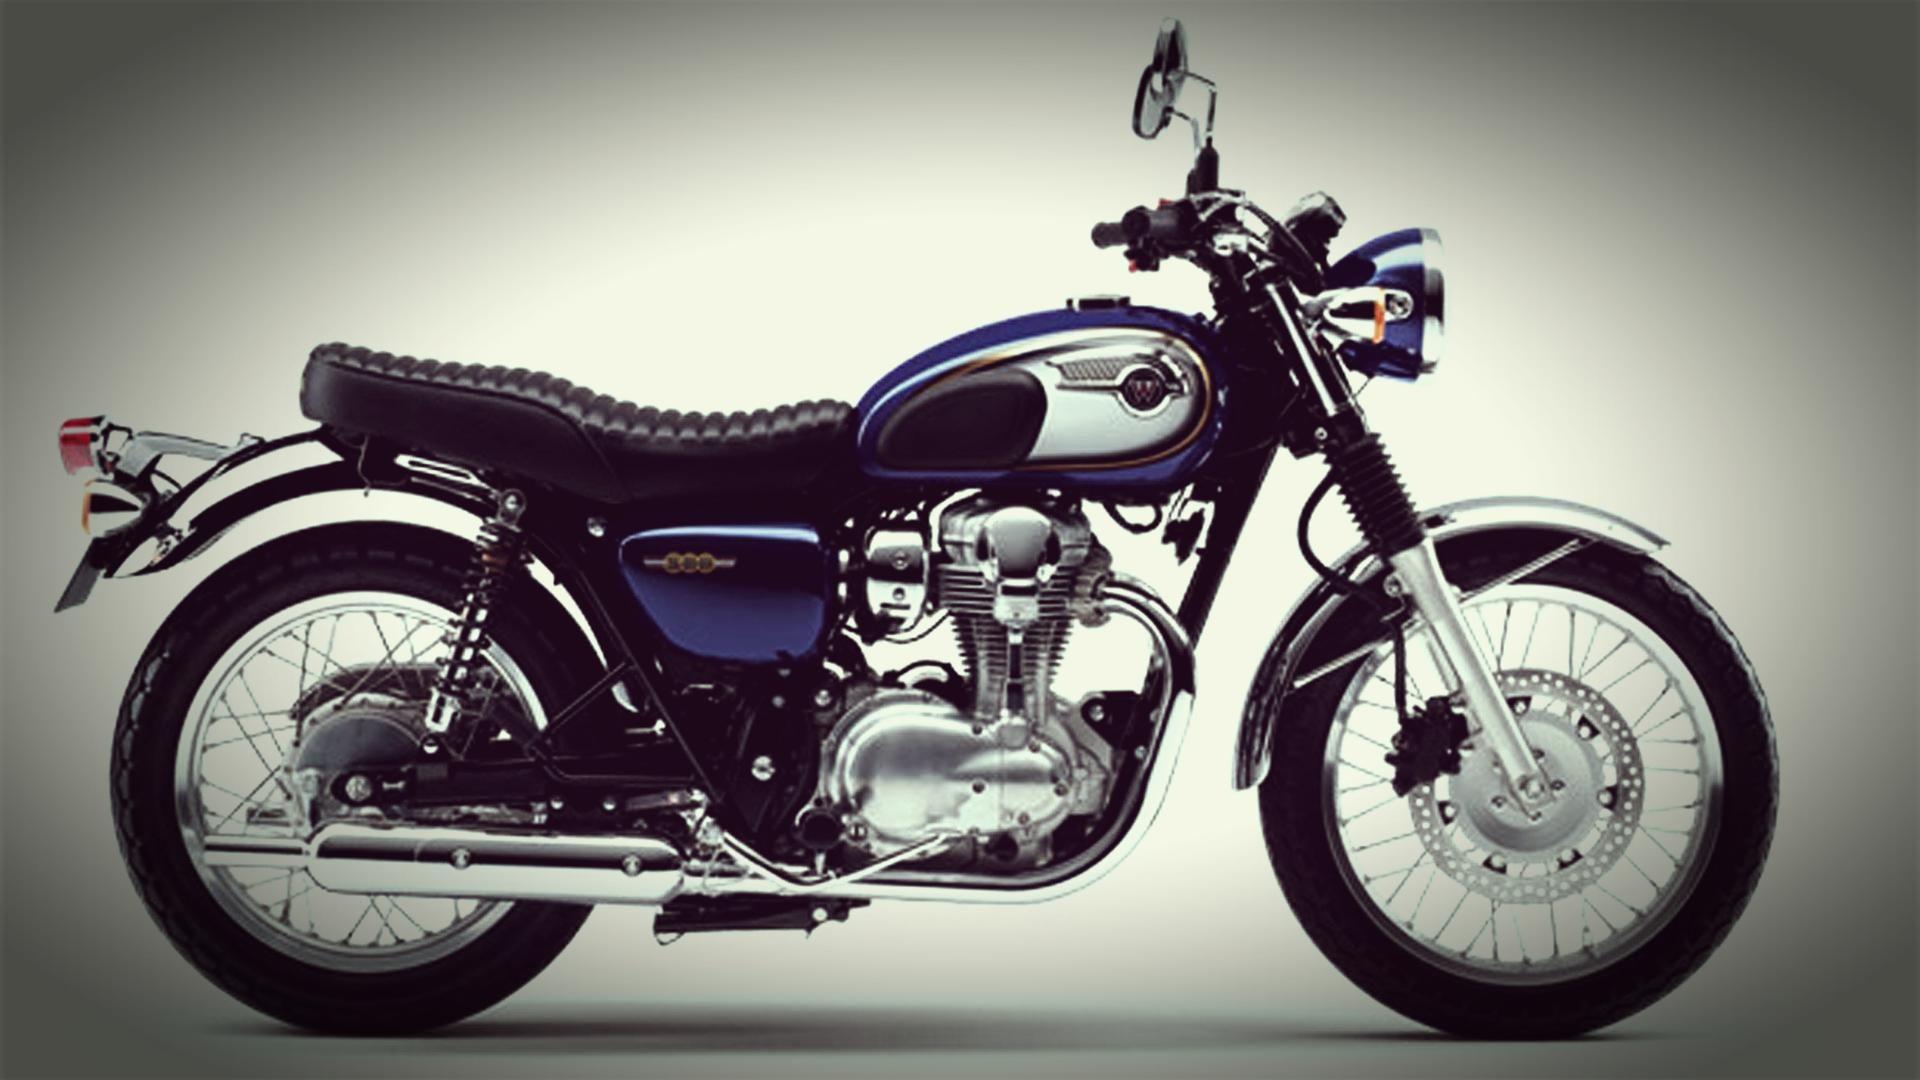 2014 Kawasaki W800 insurance 2014 Kawasaki W800 Classic Models ...